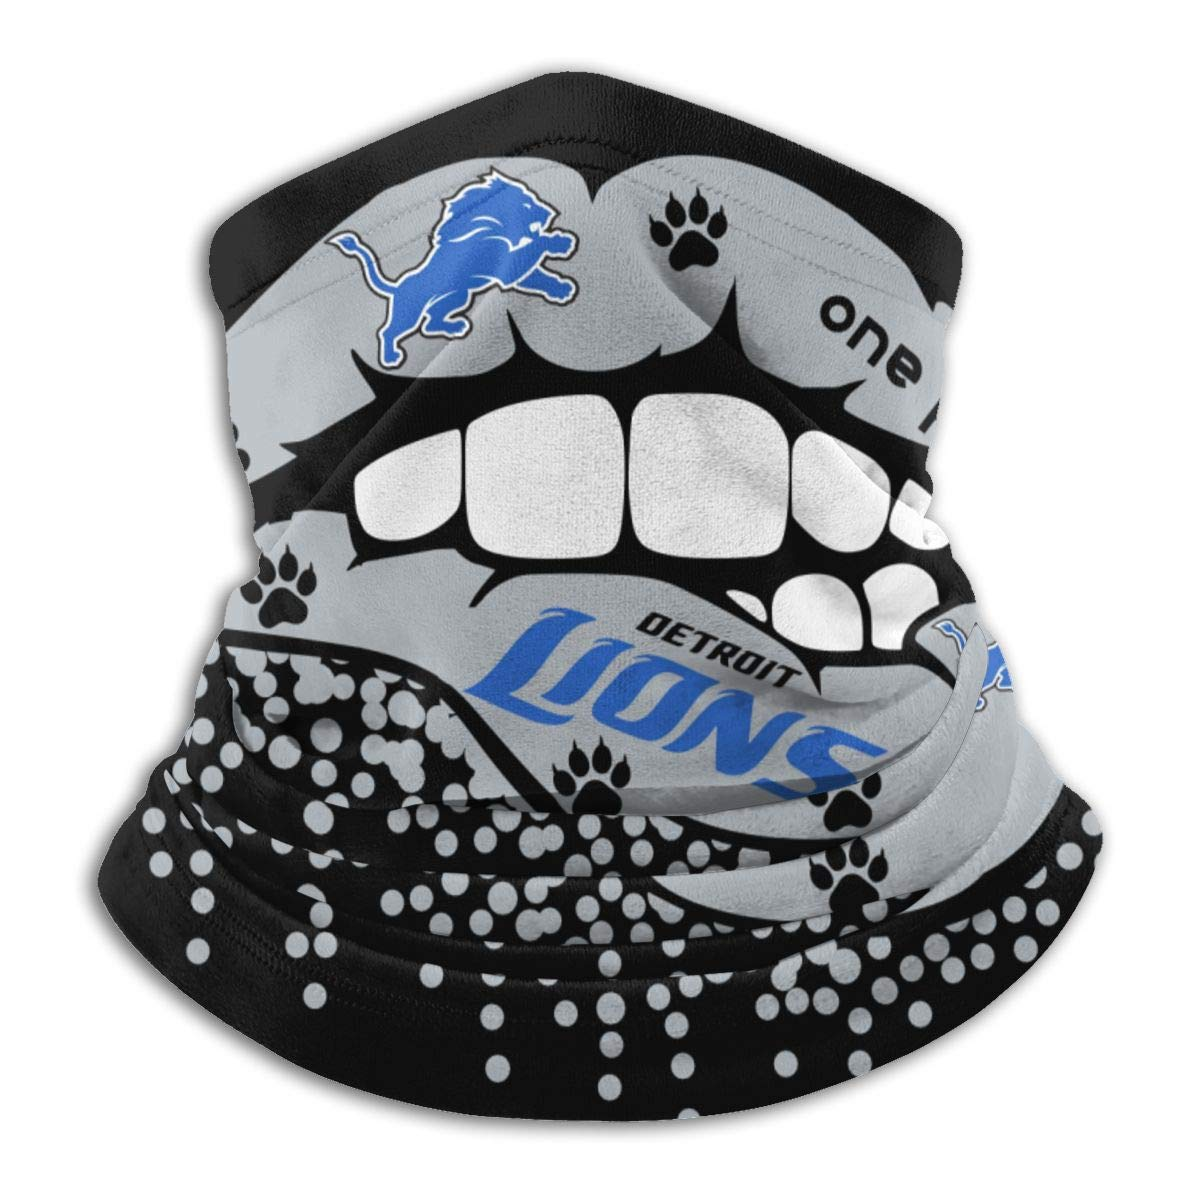 Neck Gaiters Bandana Face Mask Headwraps Headscarf Outdoor Multifunctional Headwear